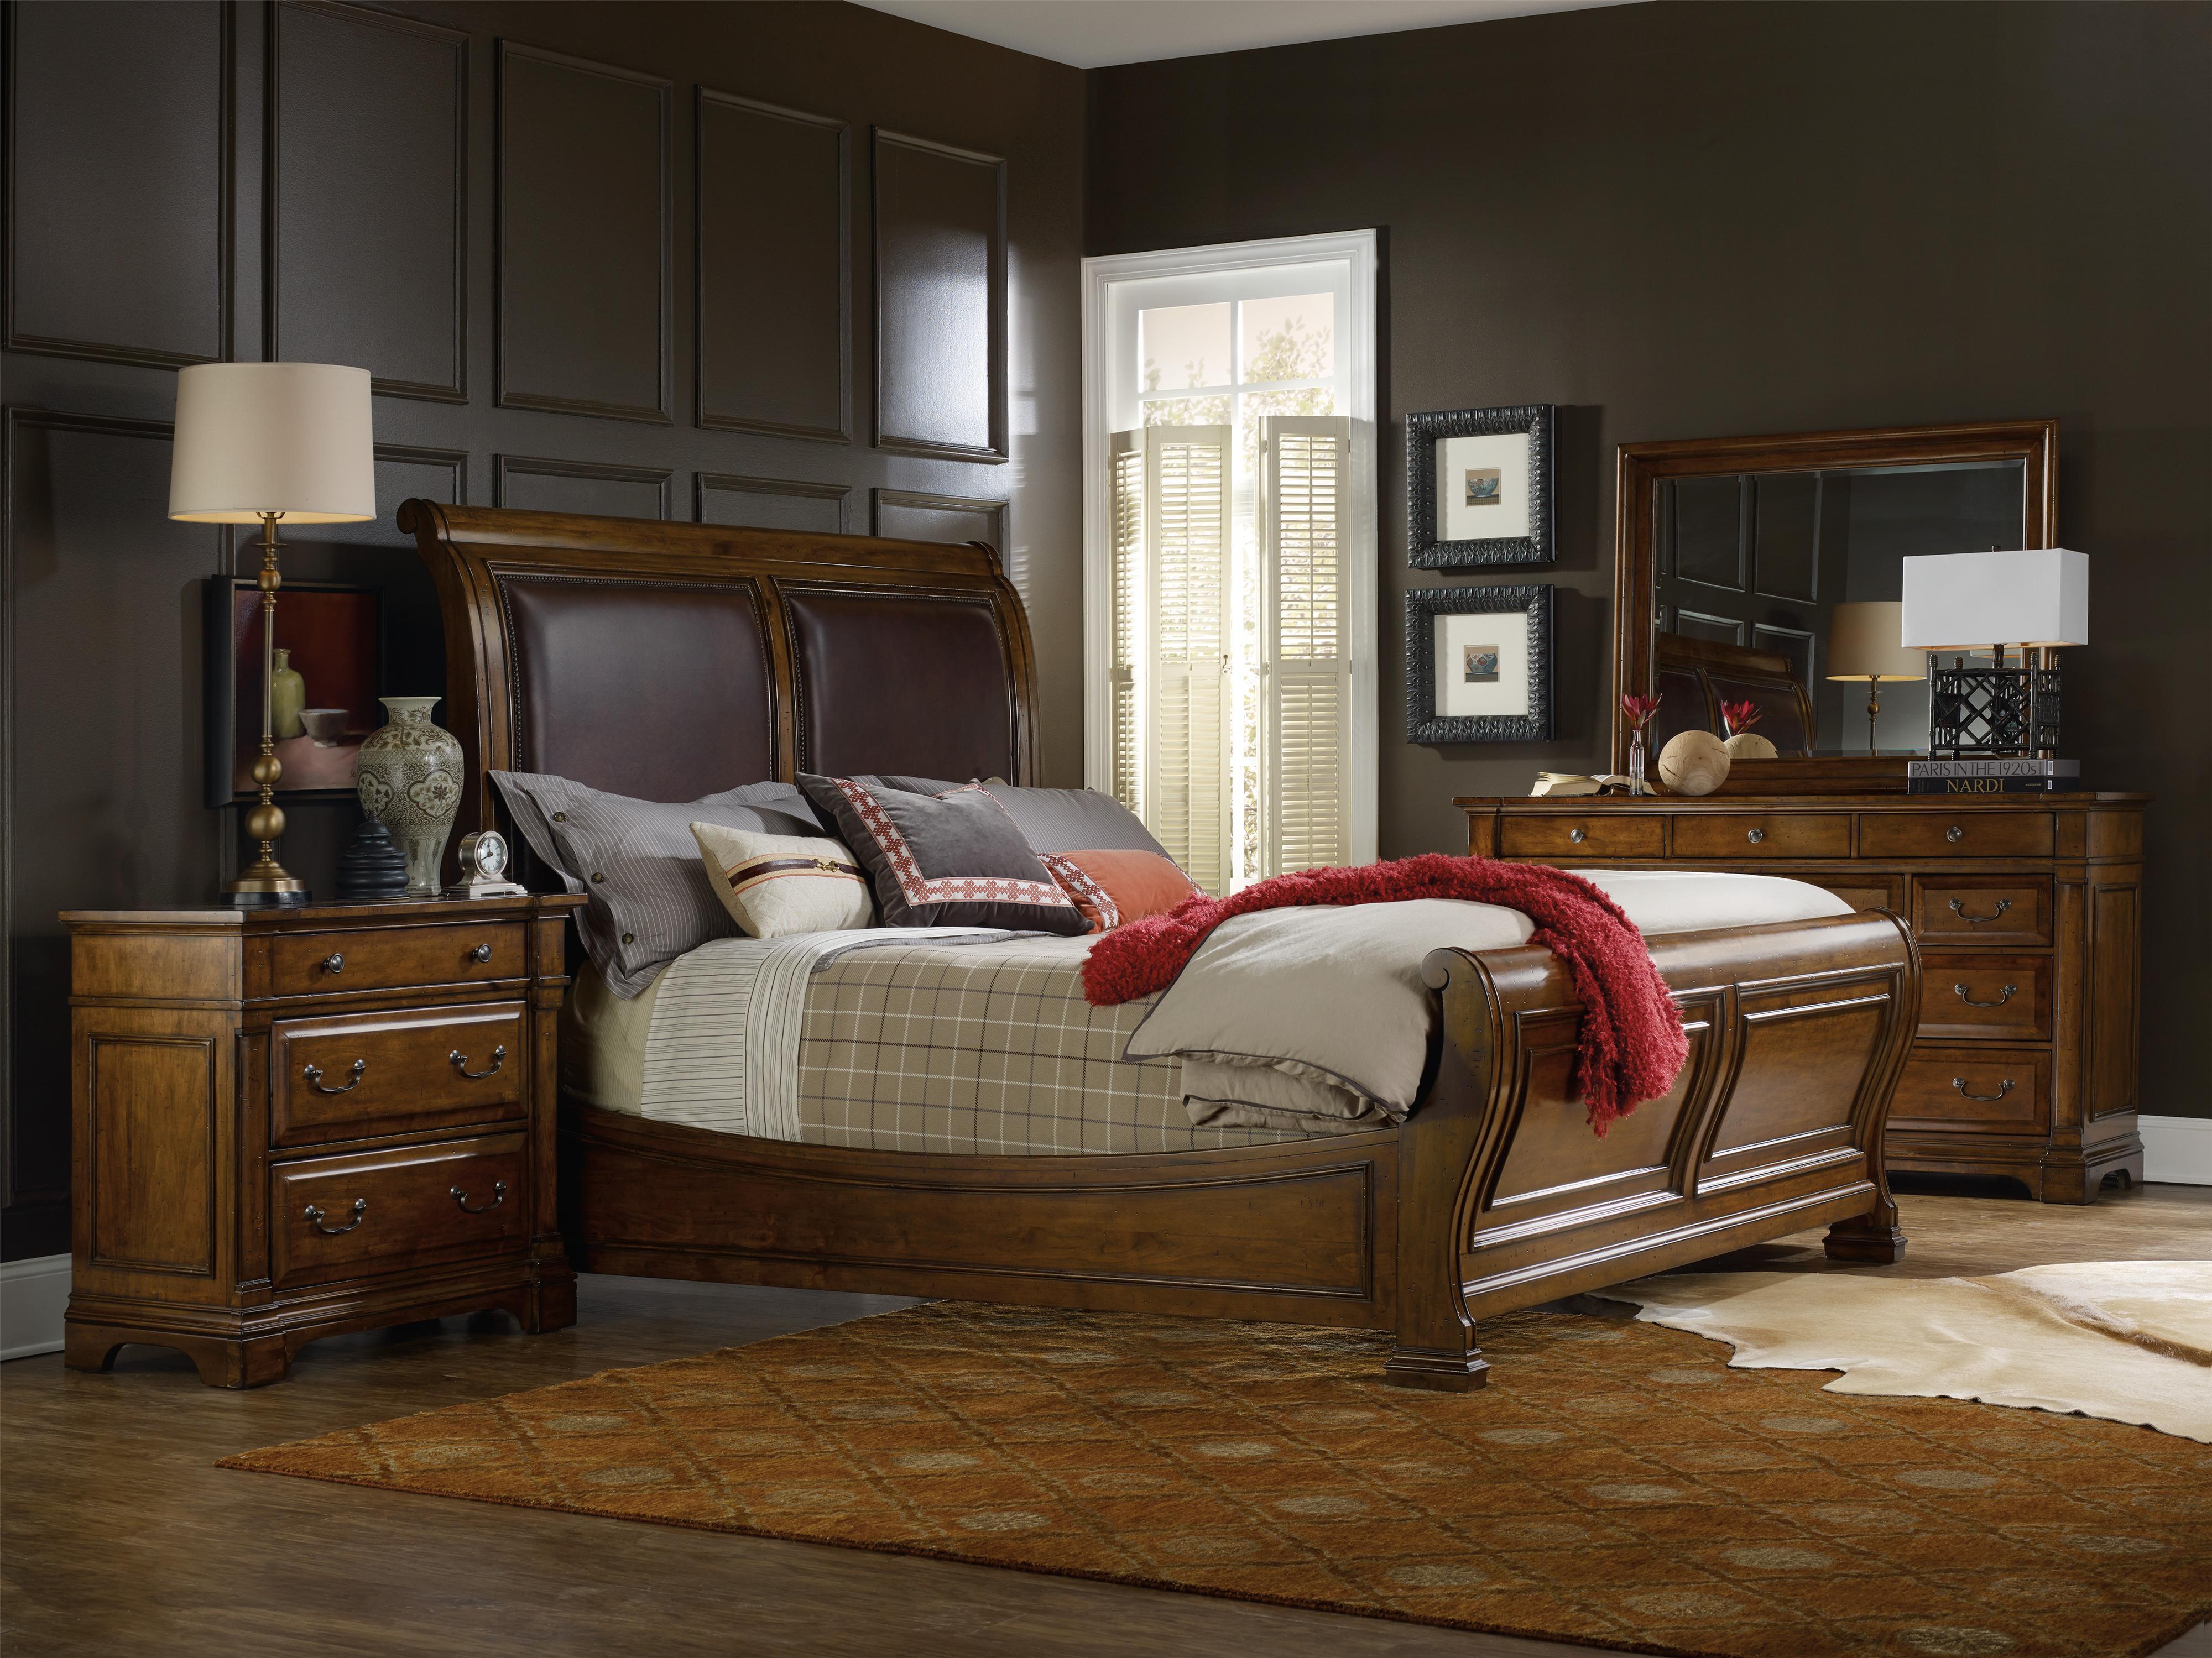 Tynecastle King Sleigh Bedroom Group by Hooker Furniture at Upper Room Home Furnishings